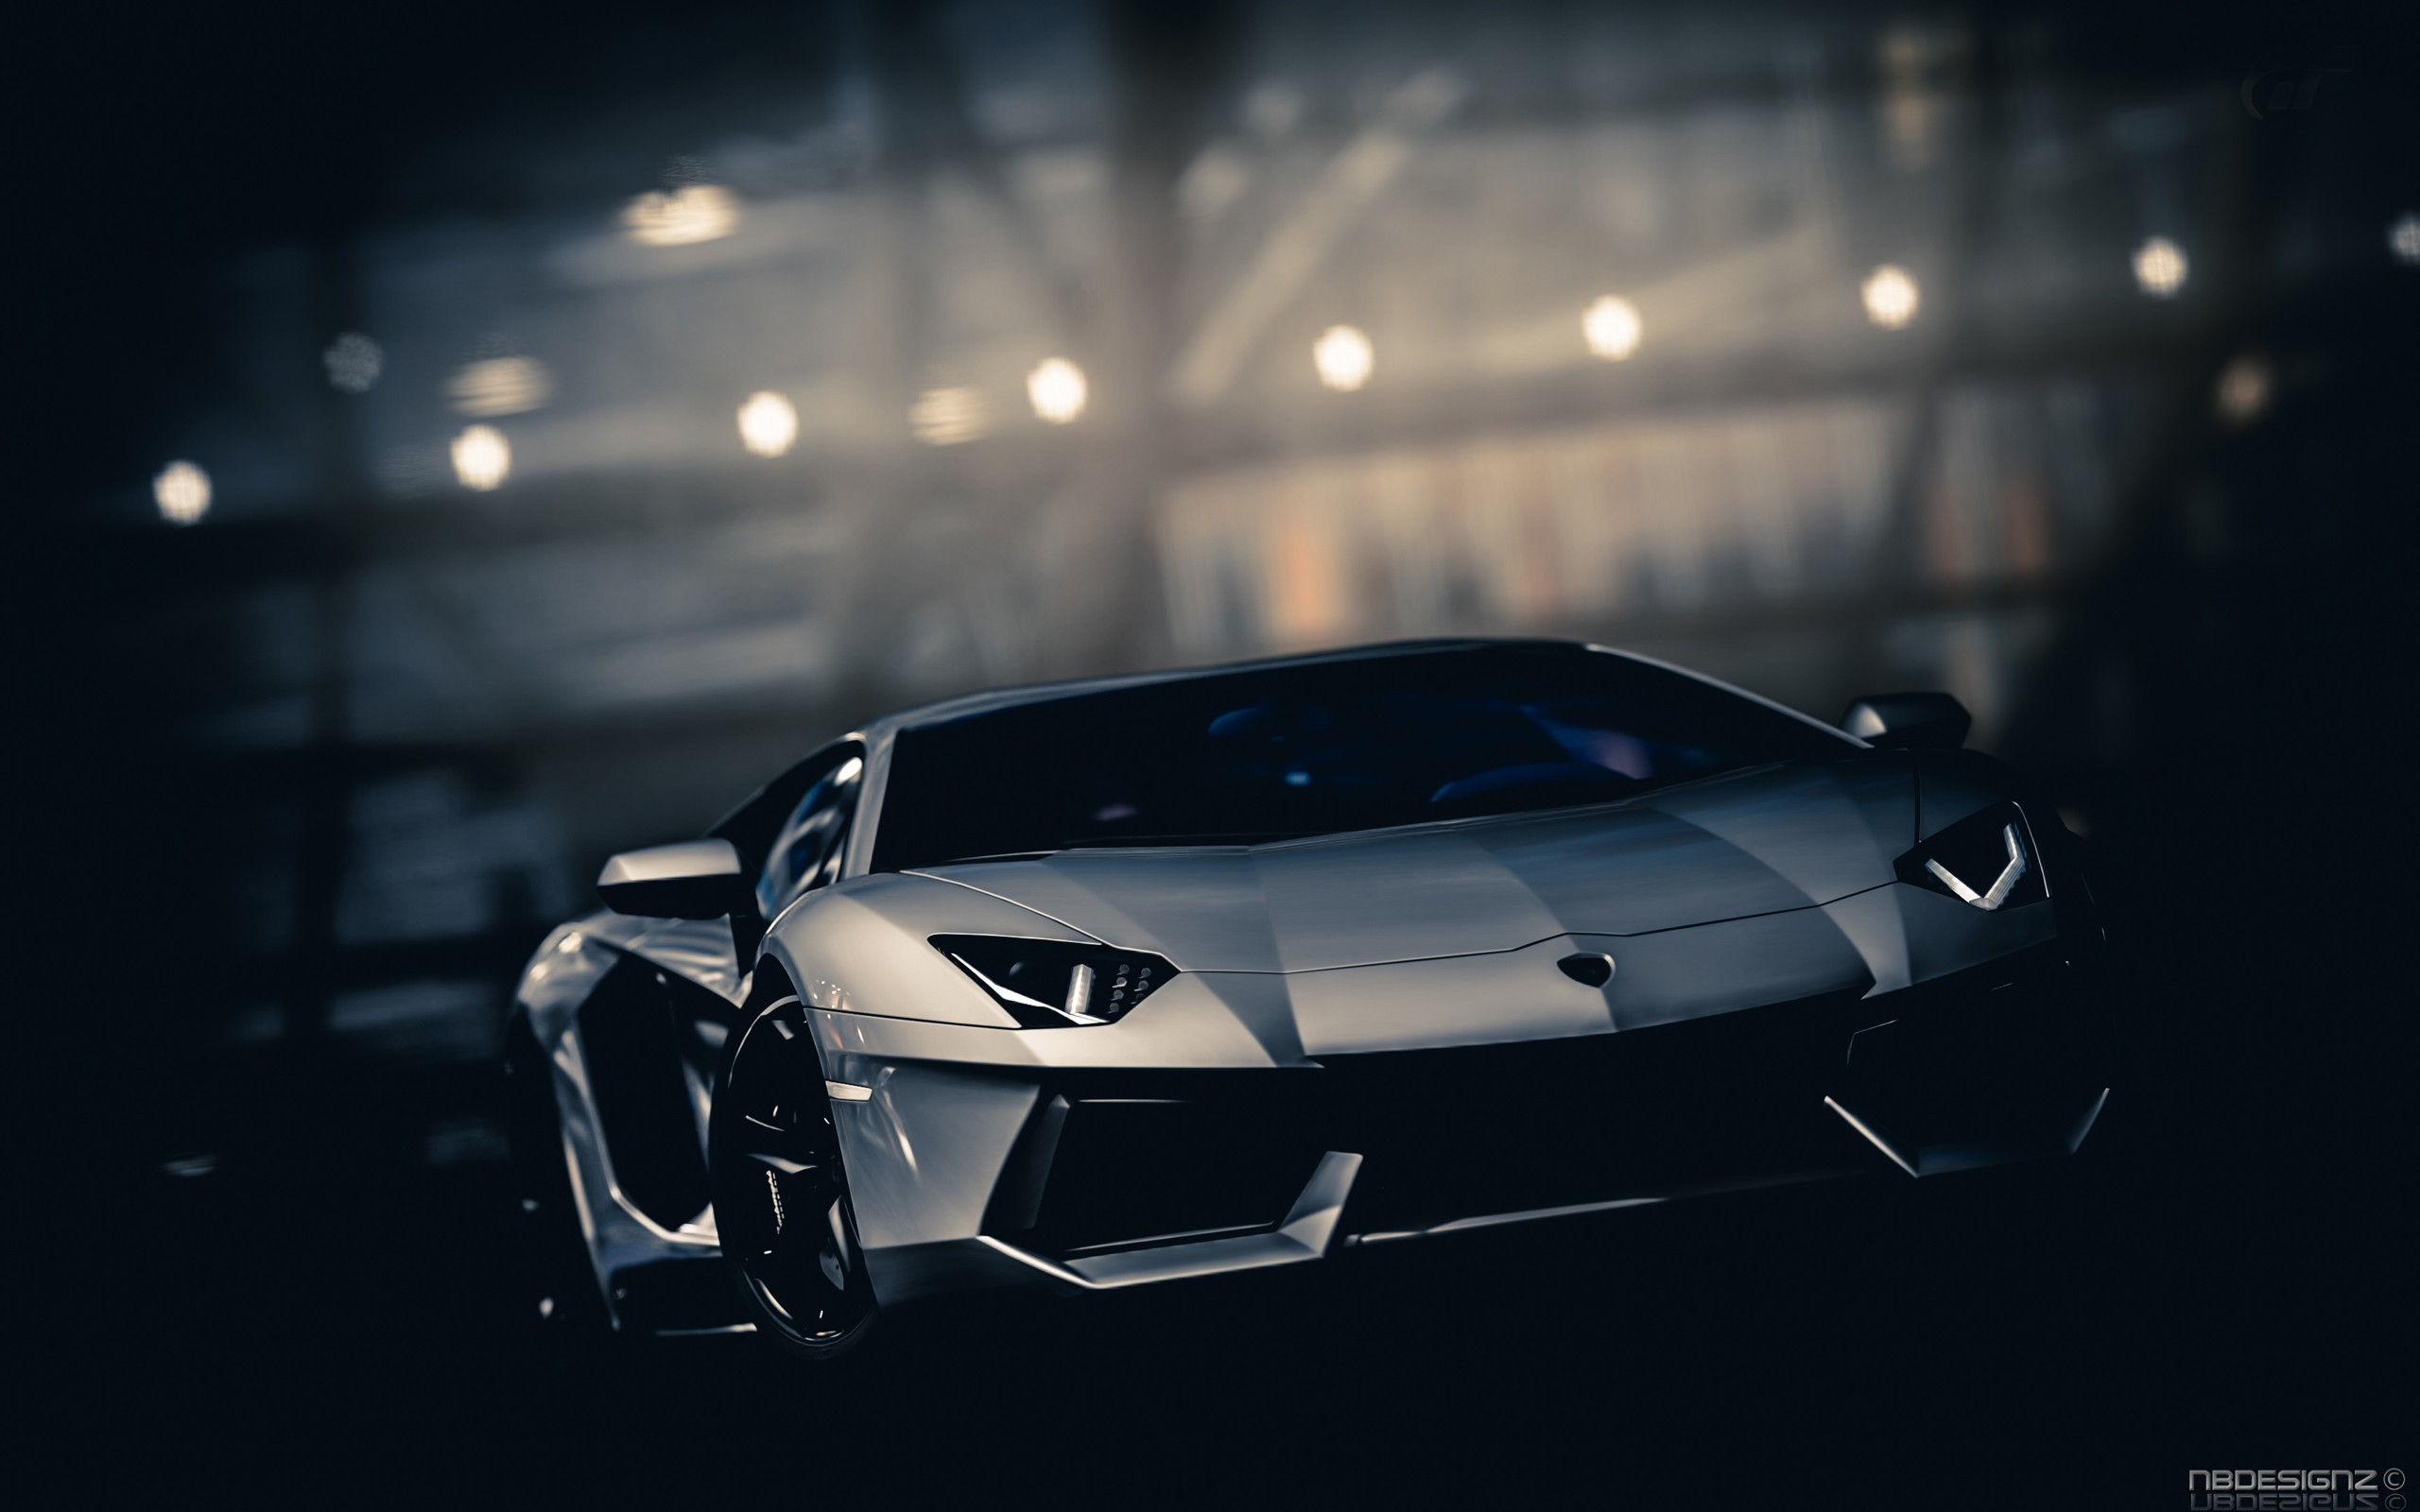 Cars-Wallpaper-Full-HD-1920×1080-Free-Download-Wallpaperxyz.